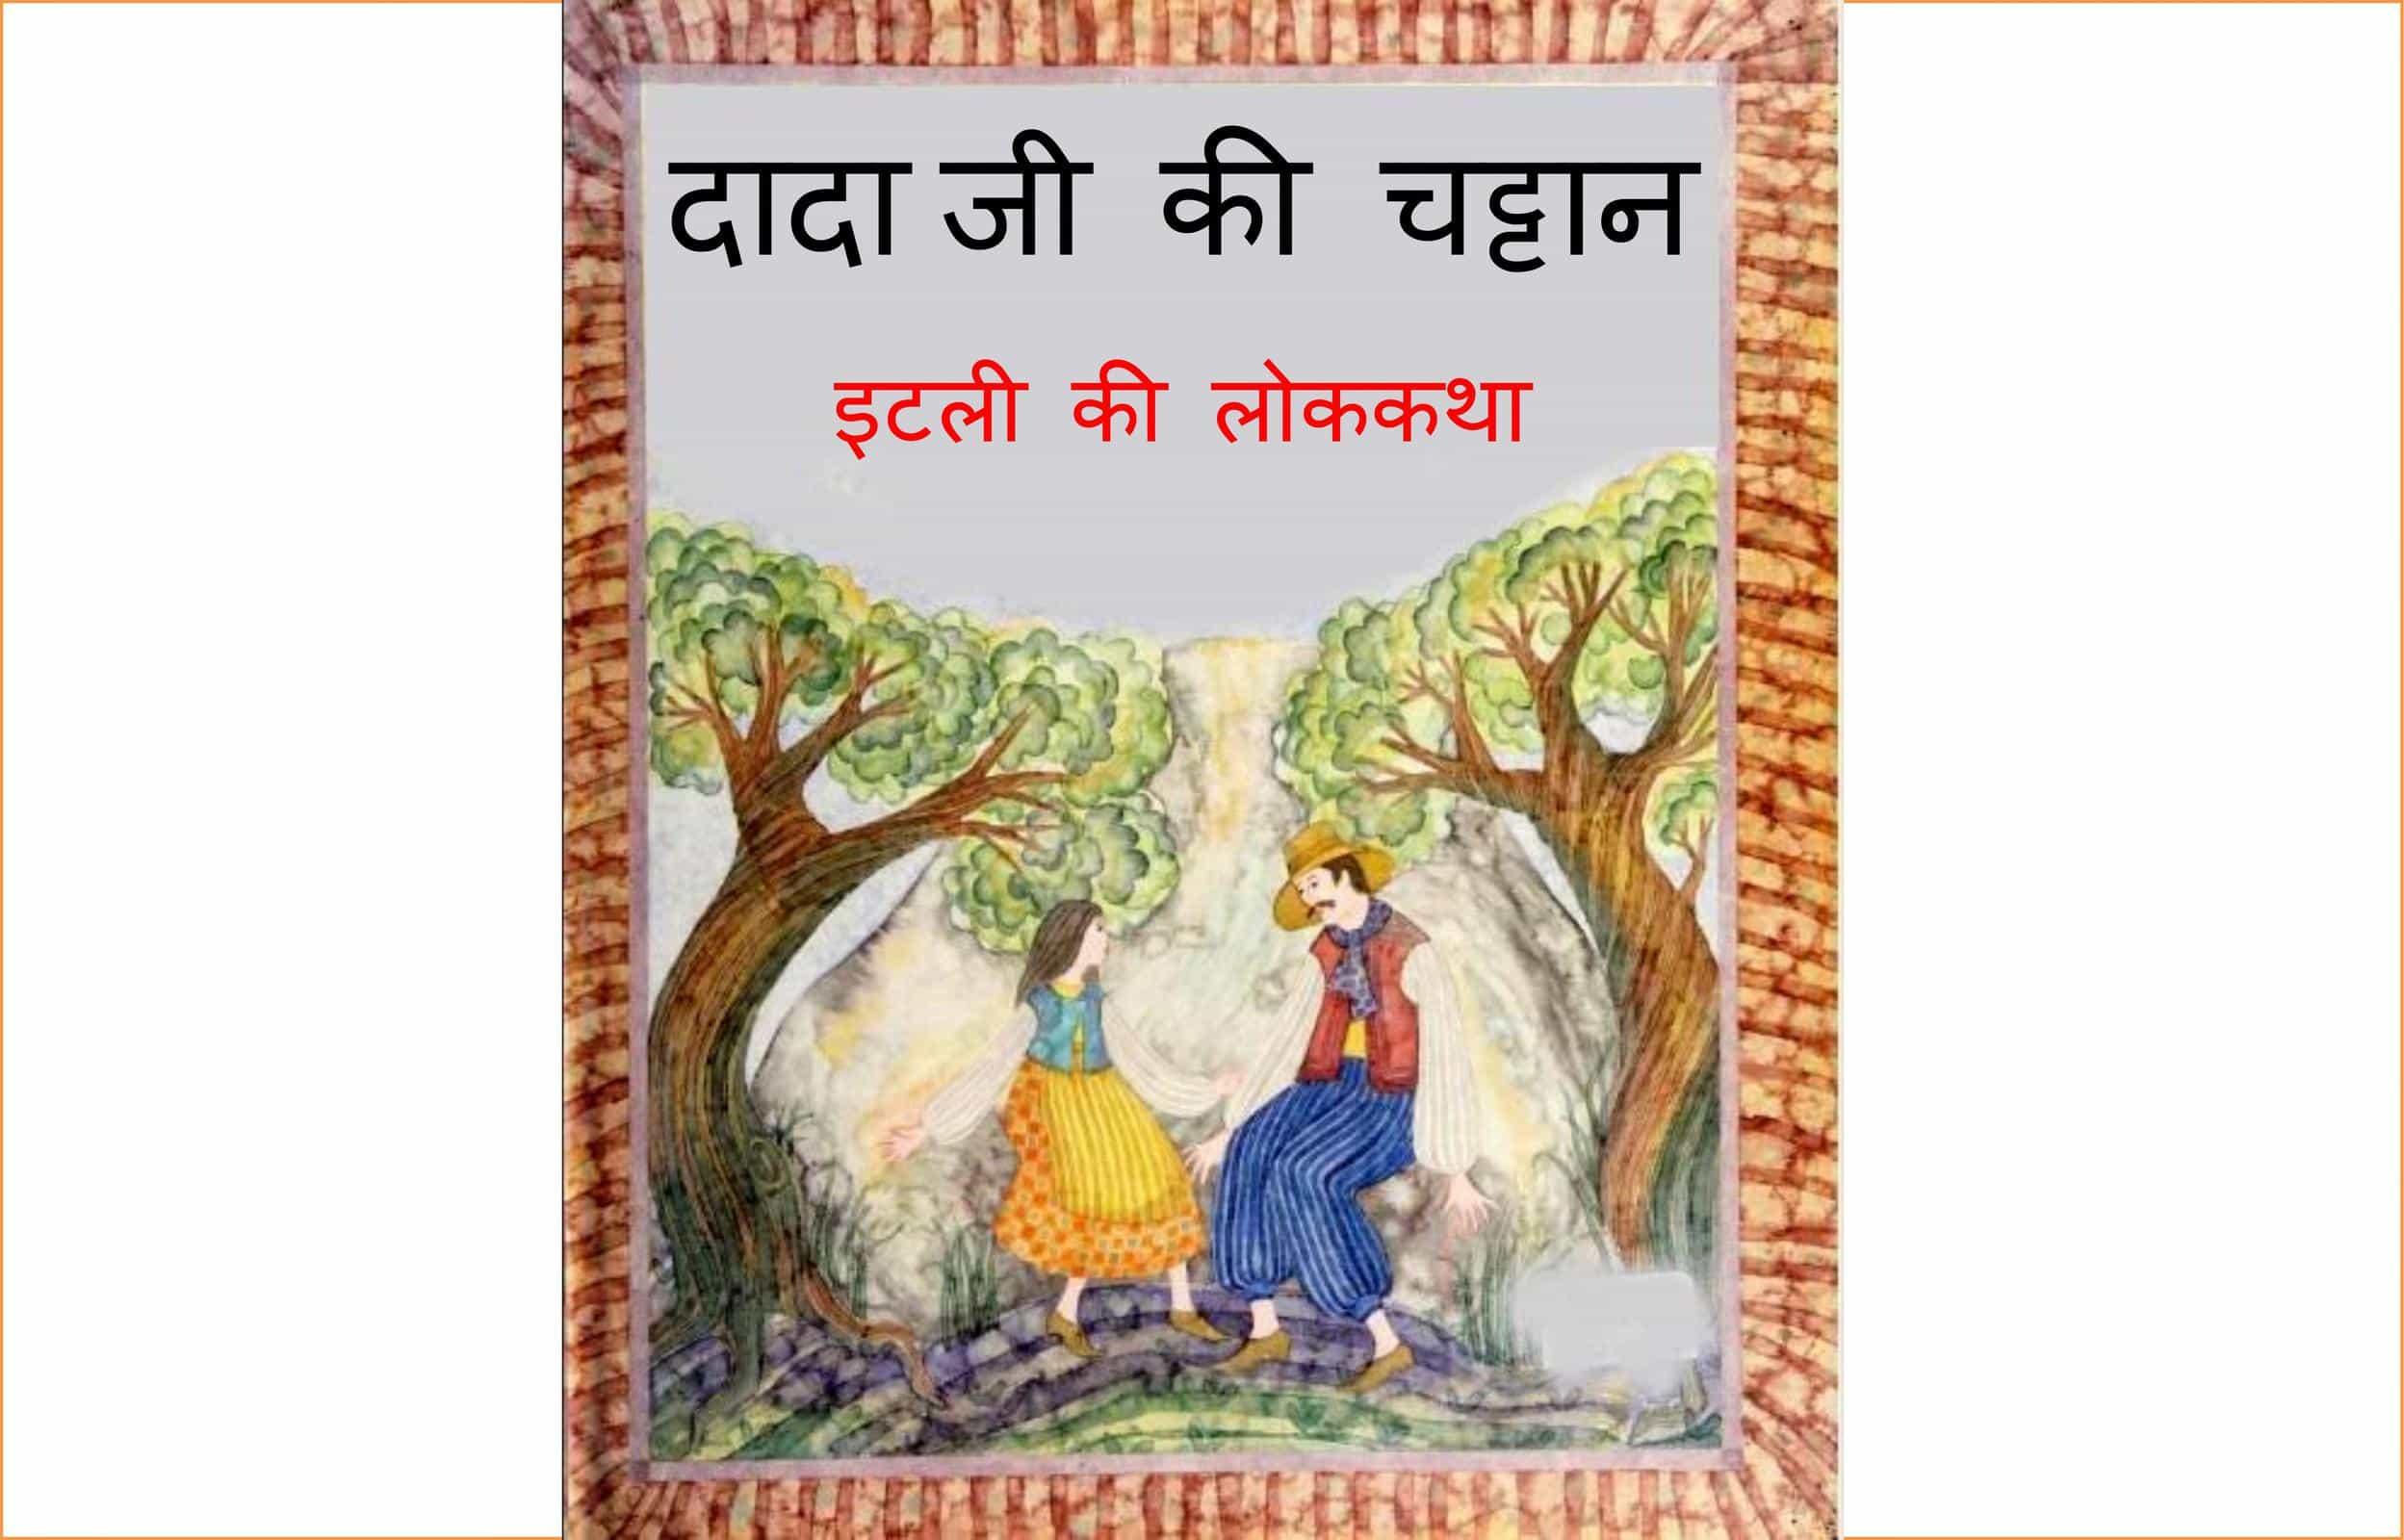 Book Image : दादा जी की चट्टान - Dada Ji Ki Chattan